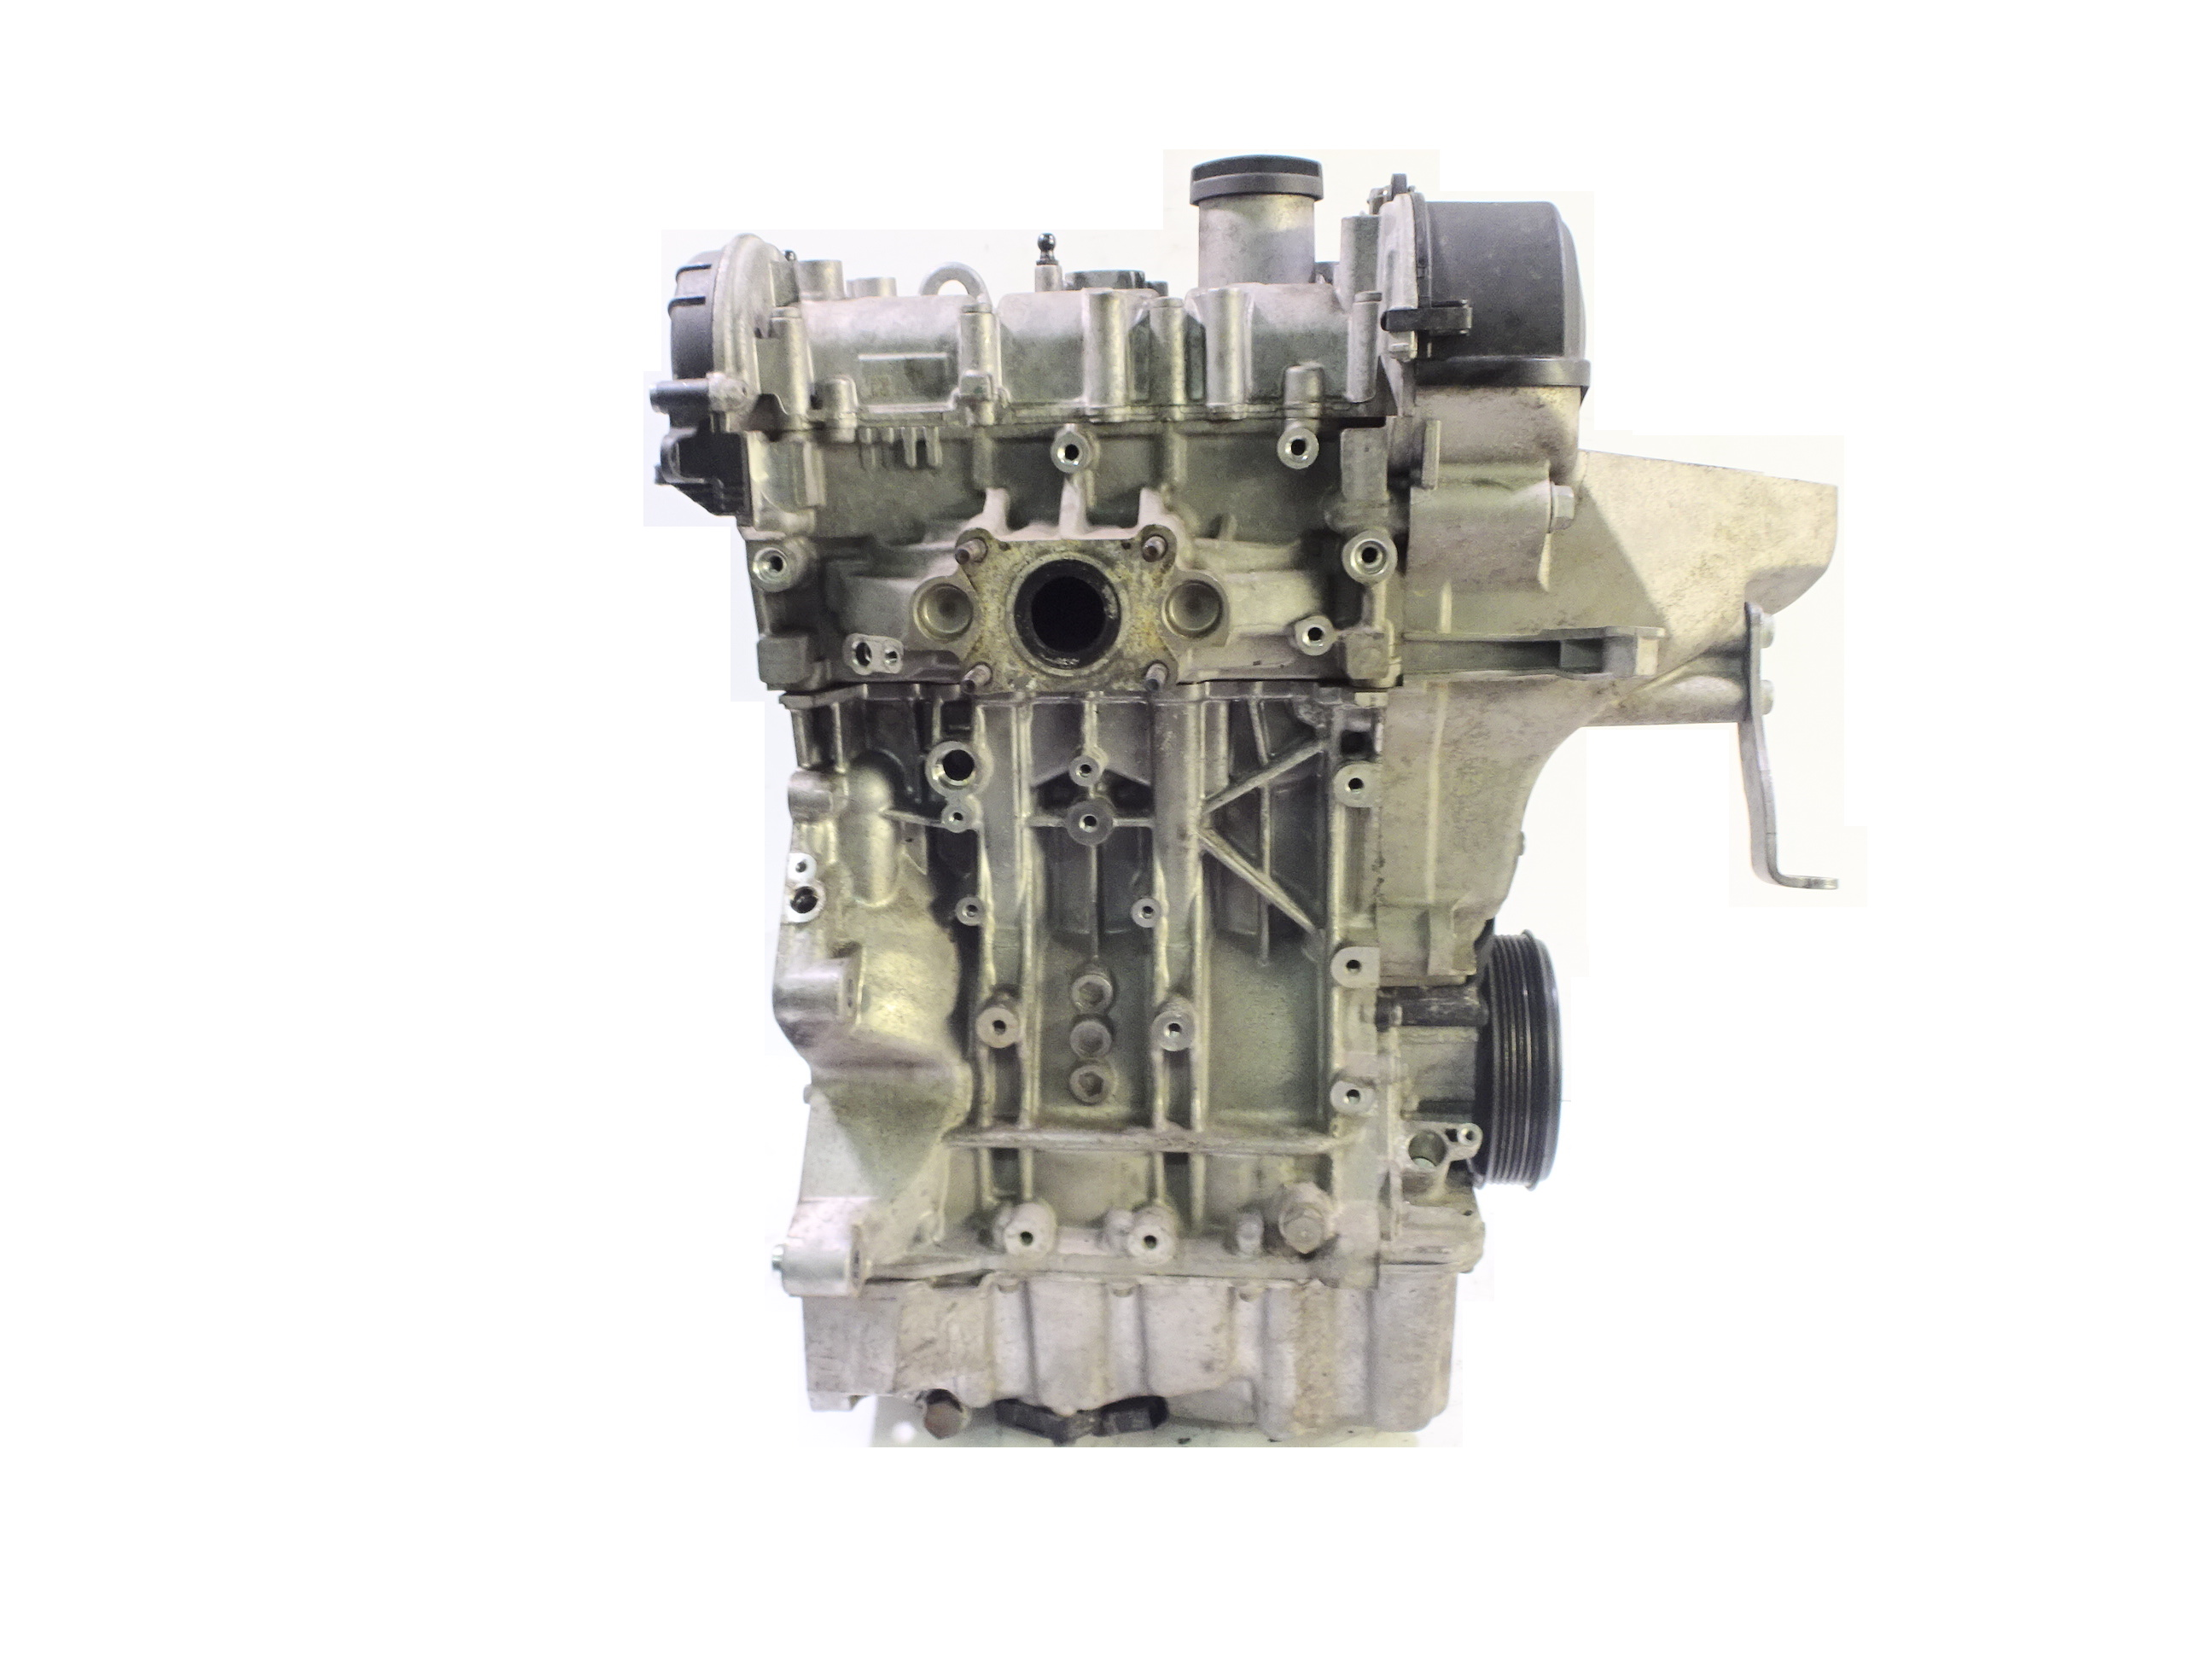 Motor 2016 VW Seat Skoda Audi 1,0 TSI CHZ CHZA CHZB CHZC CHZD CHZG CHZJ